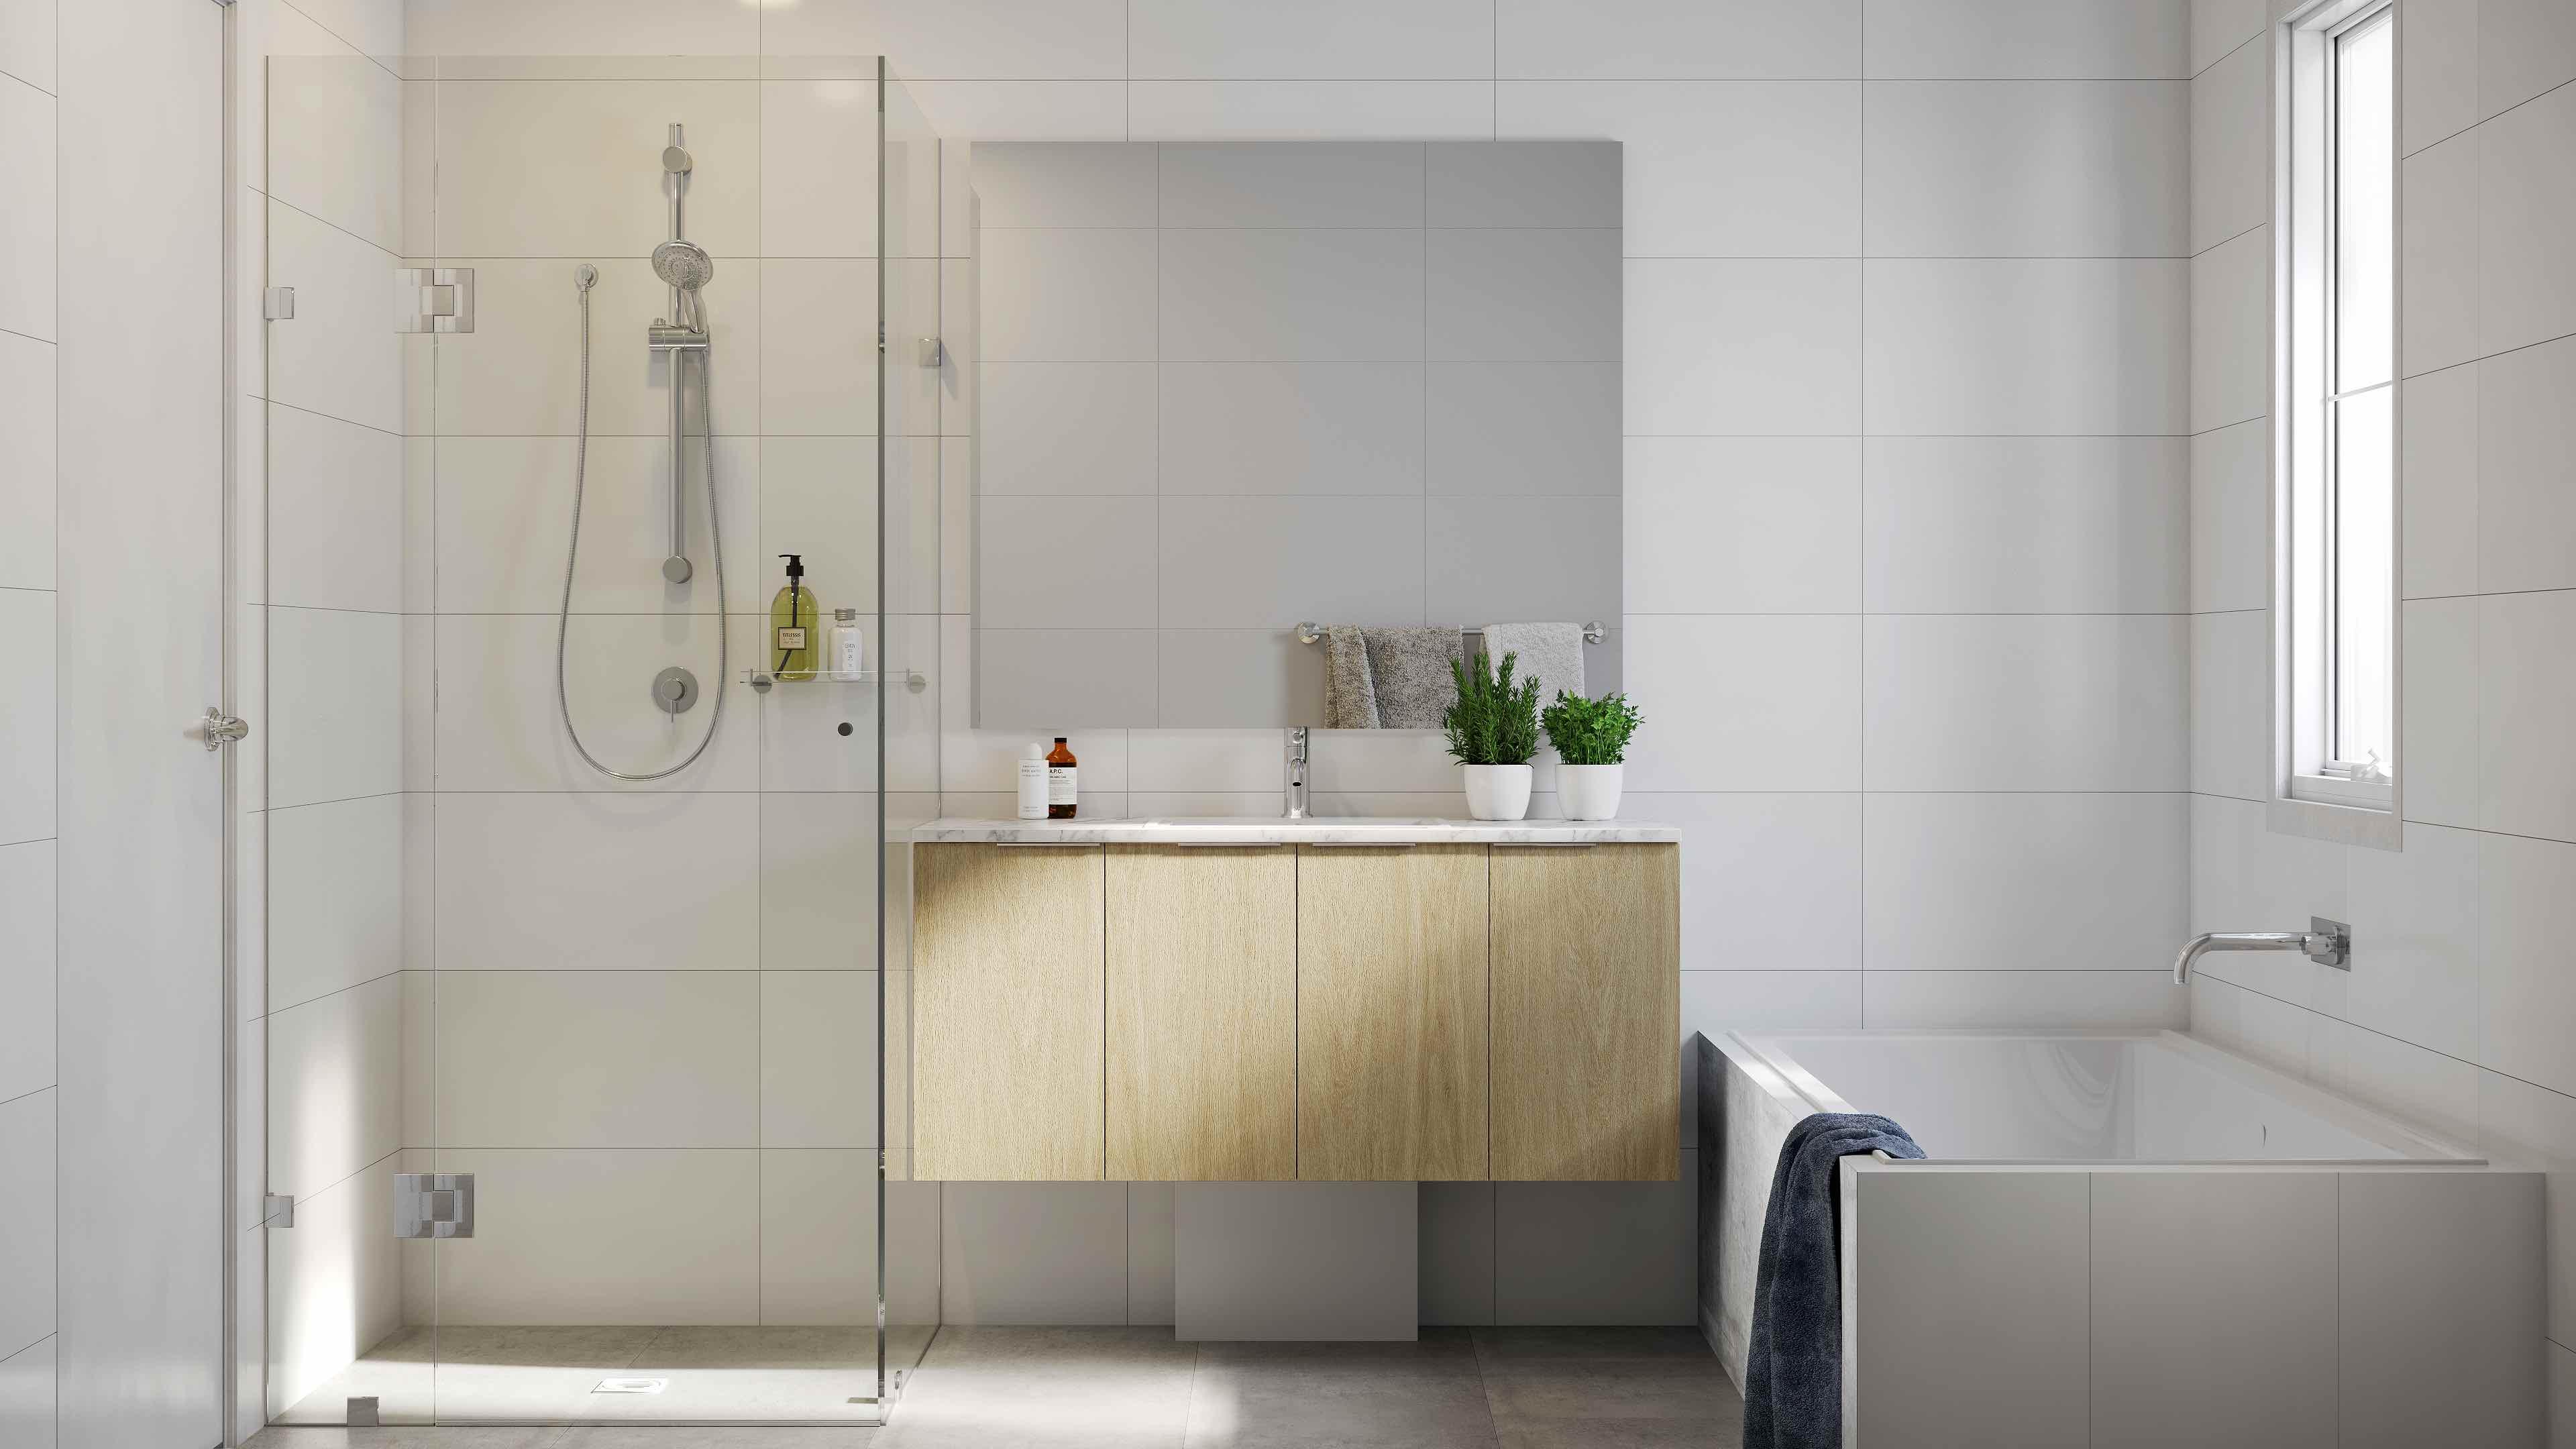 5Hazel_Bathroom_FinalRender_v1.0